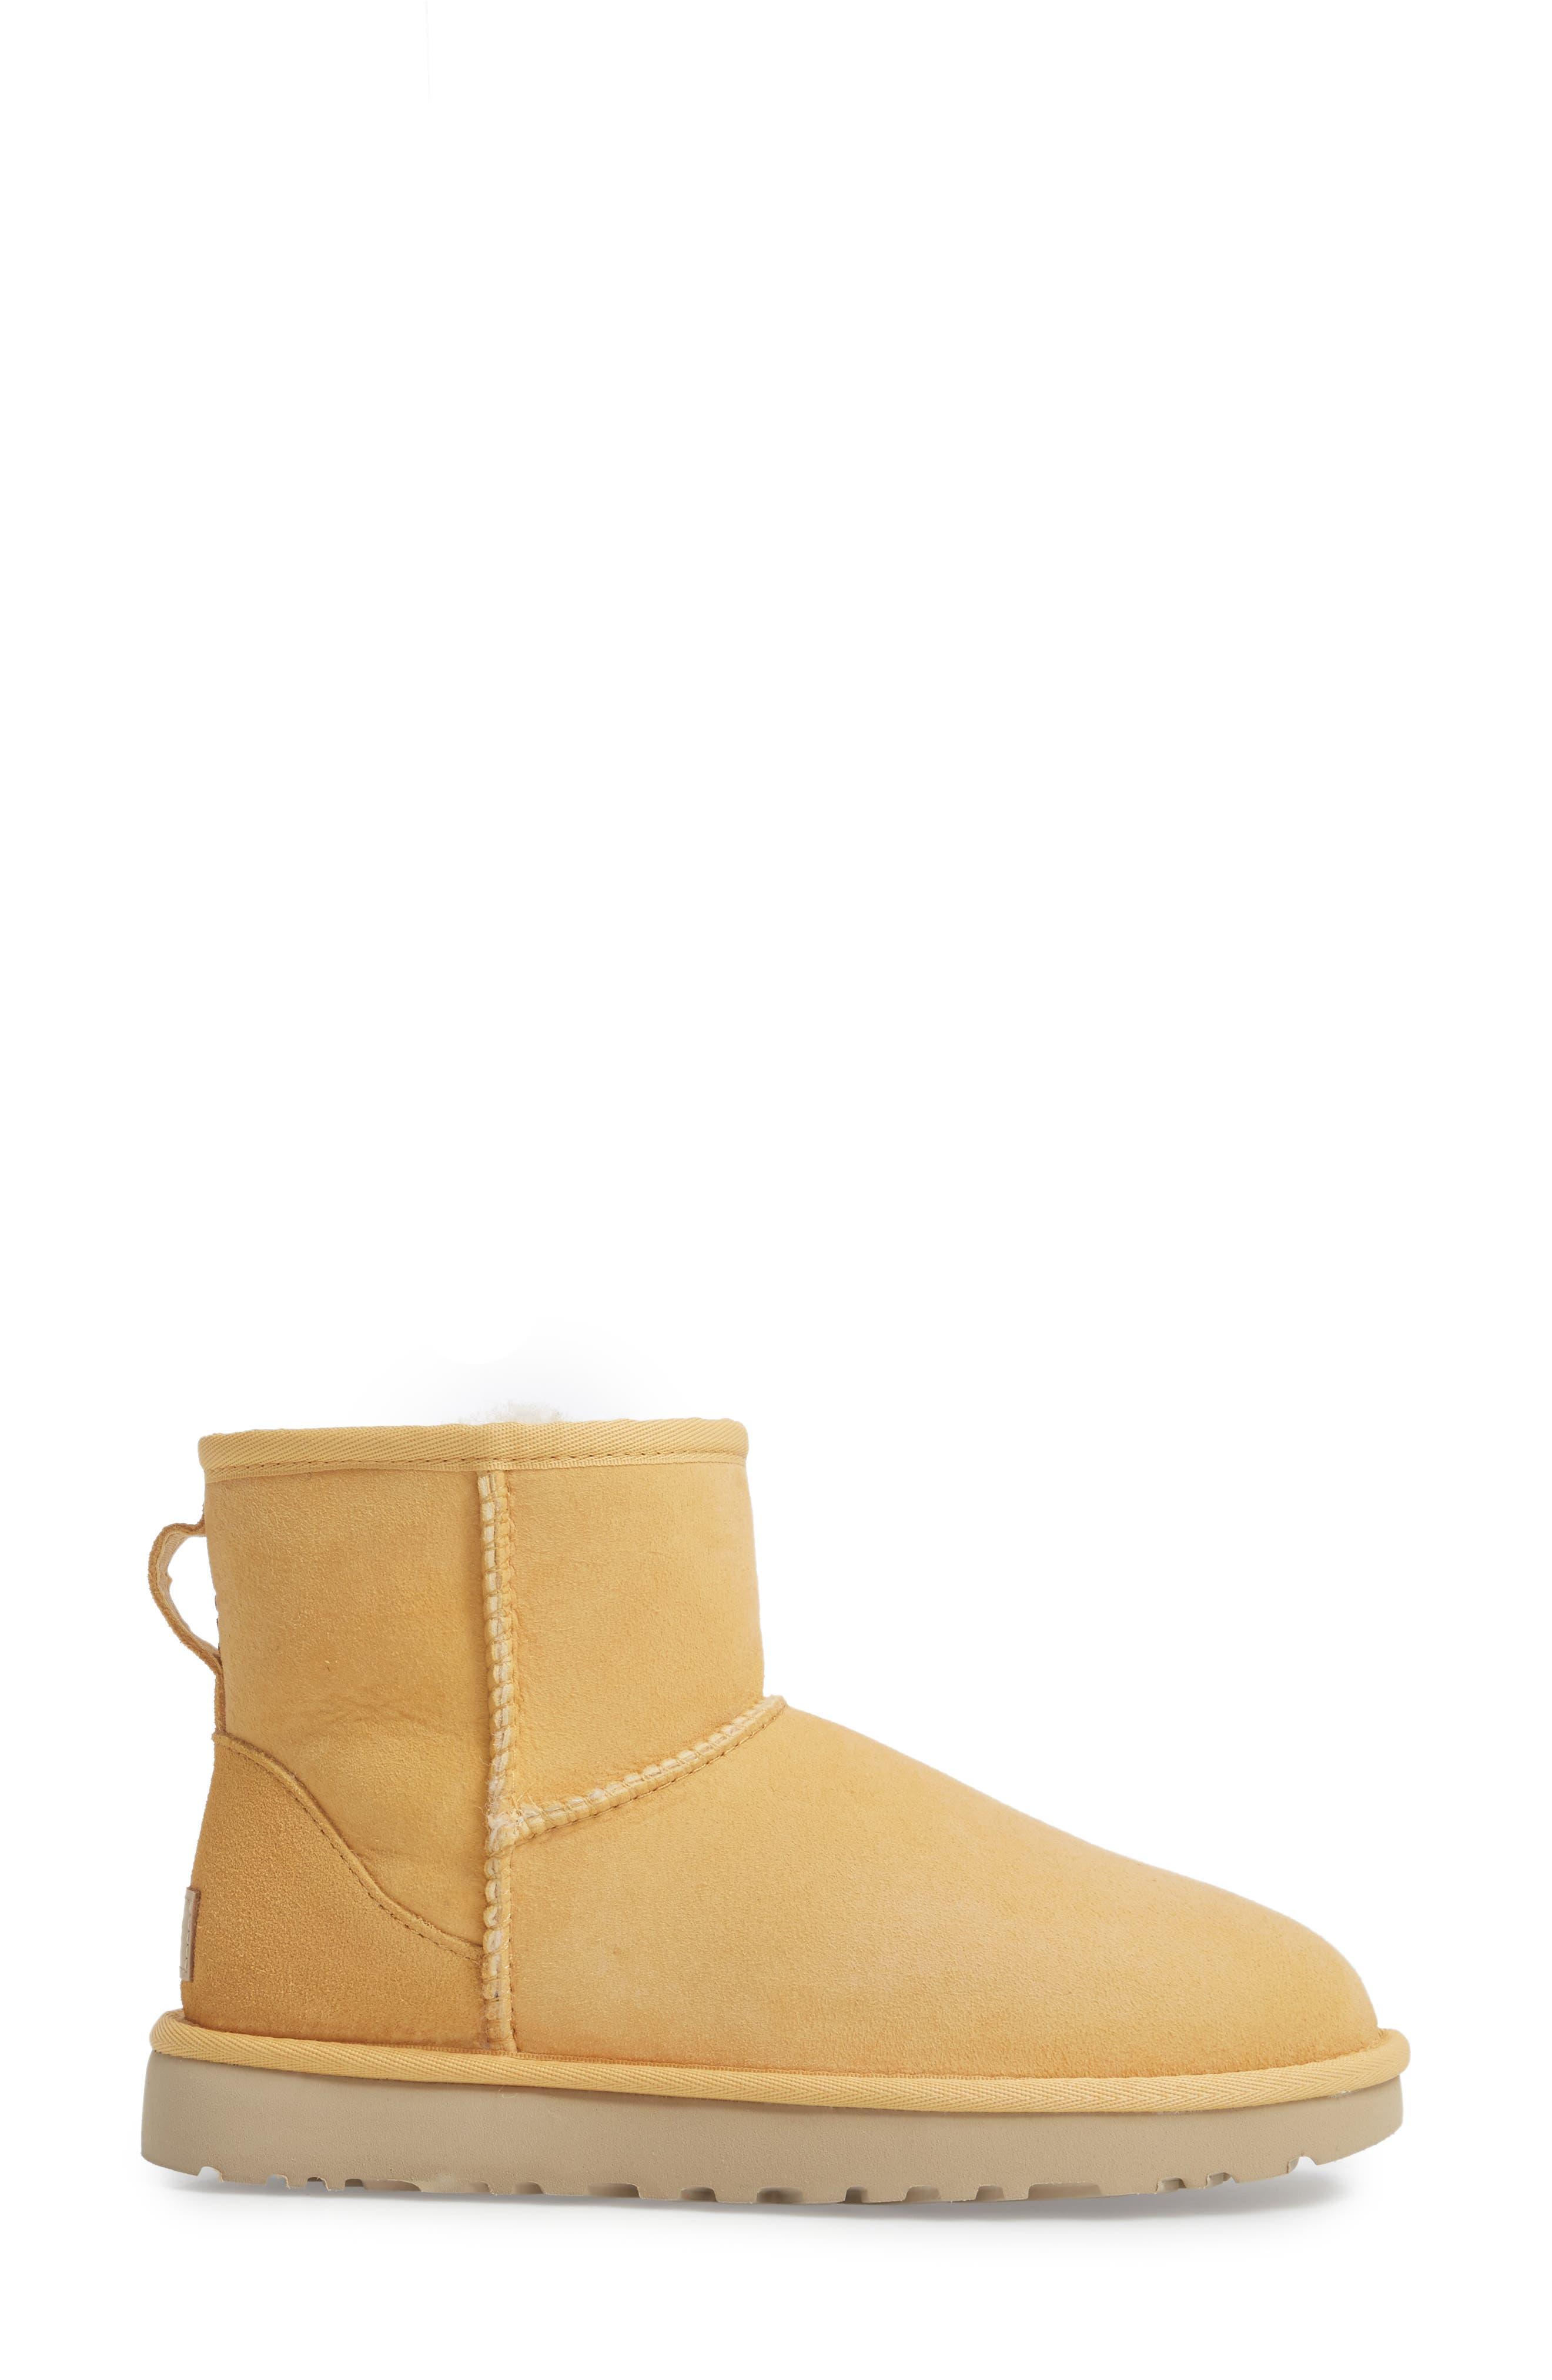 ,                             Classic Mini II Genuine Shearling Lined Boot,                             Alternate thumbnail 83, color,                             700